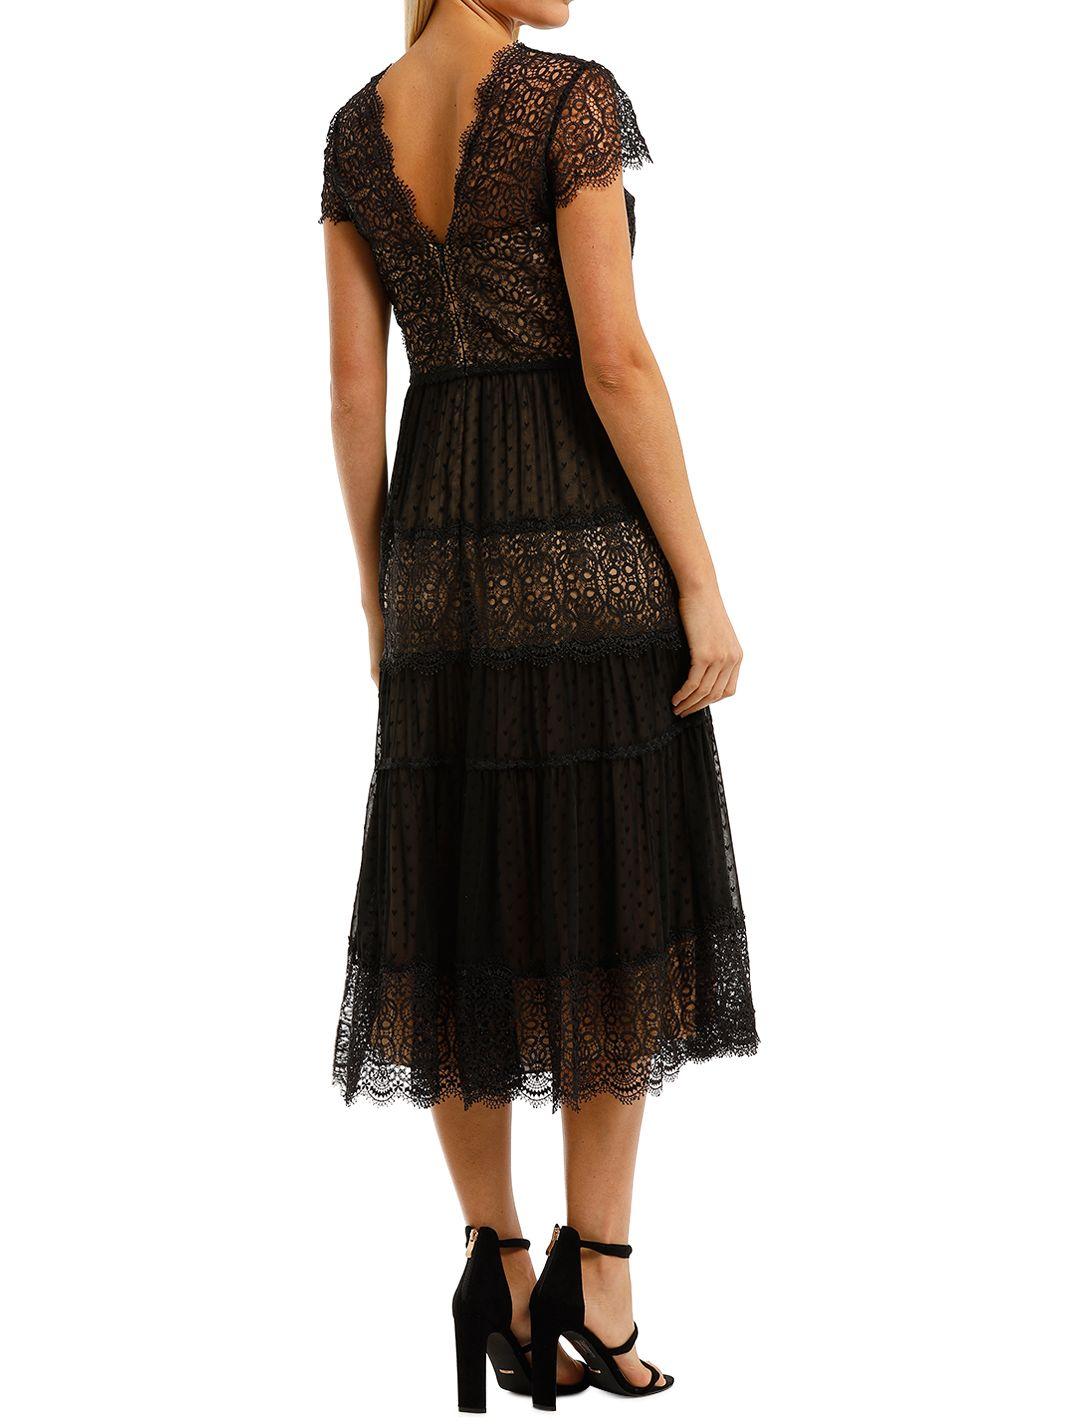 Catherine-Deane-Lala-Dress-Black-Back